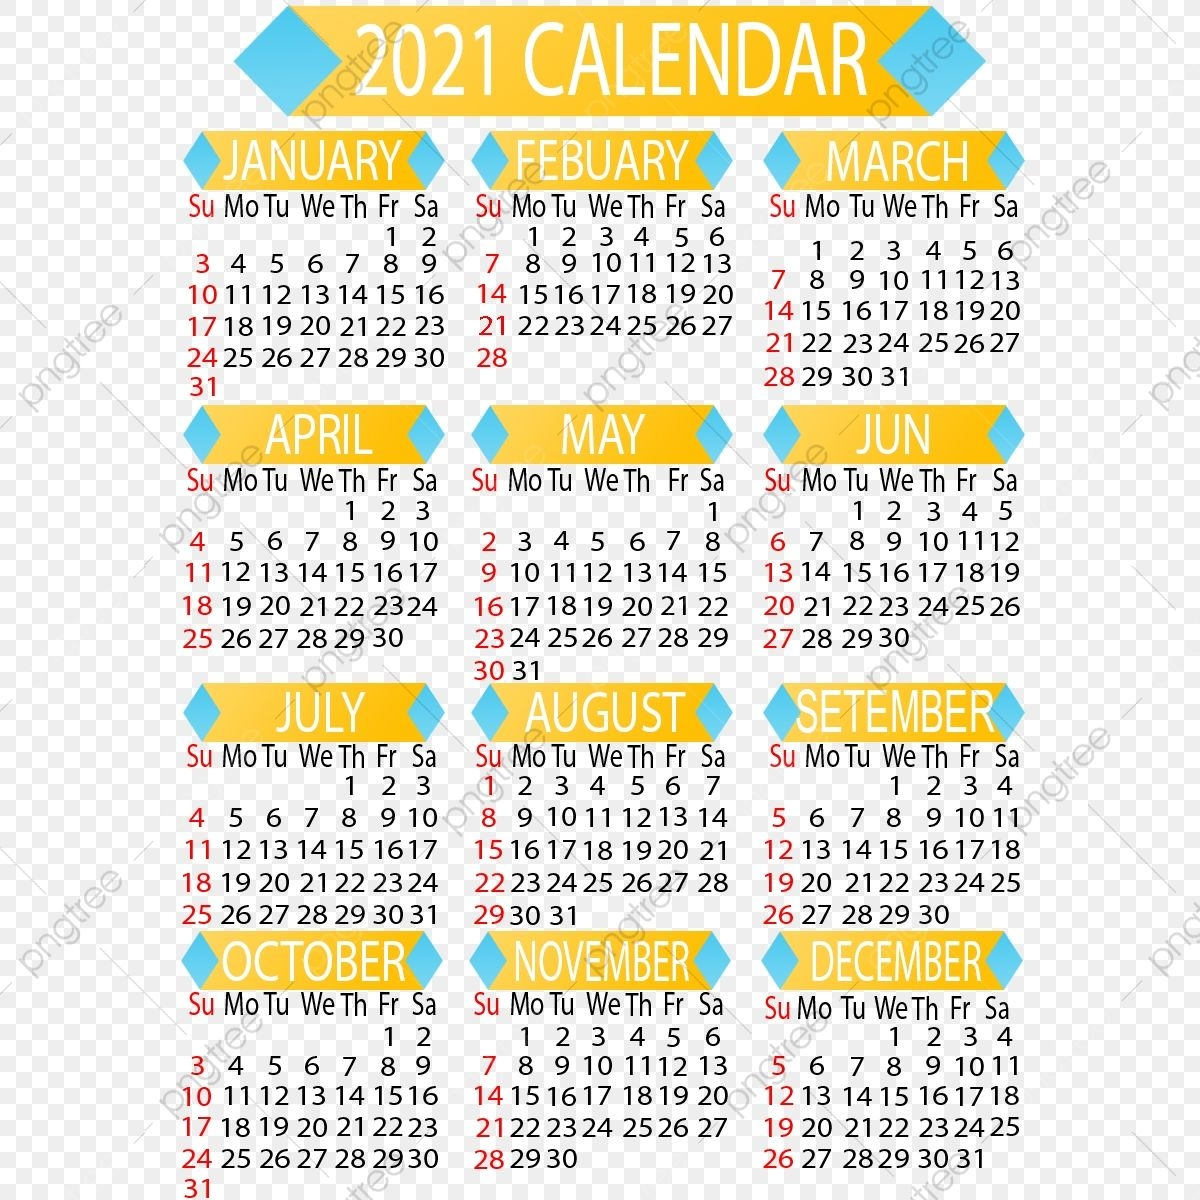 2021 Annual Calendar, Calendar Victor, Hand Draw, Design Png